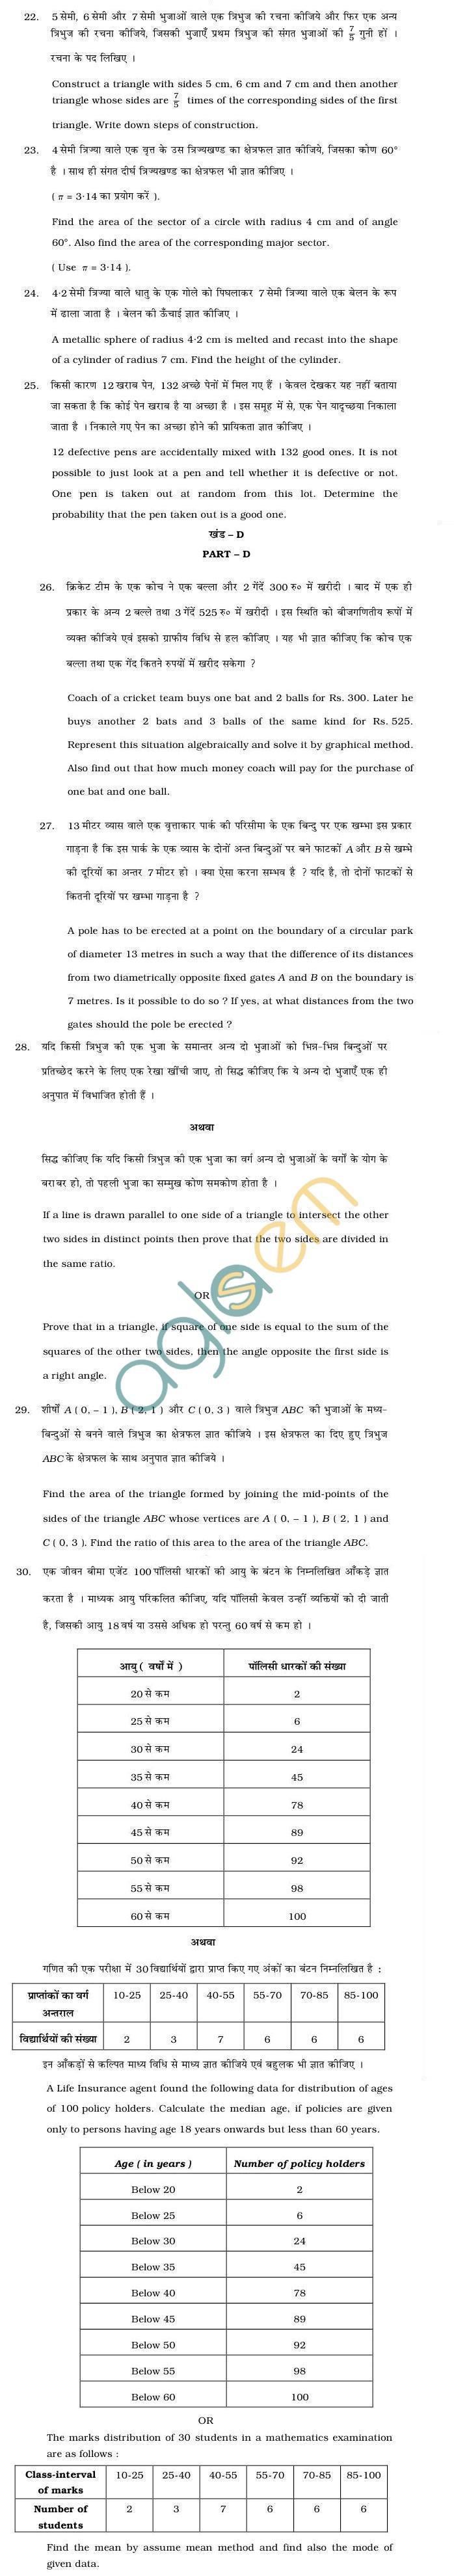 Rajasthan Board Praveshika Maths Question Paper 2013